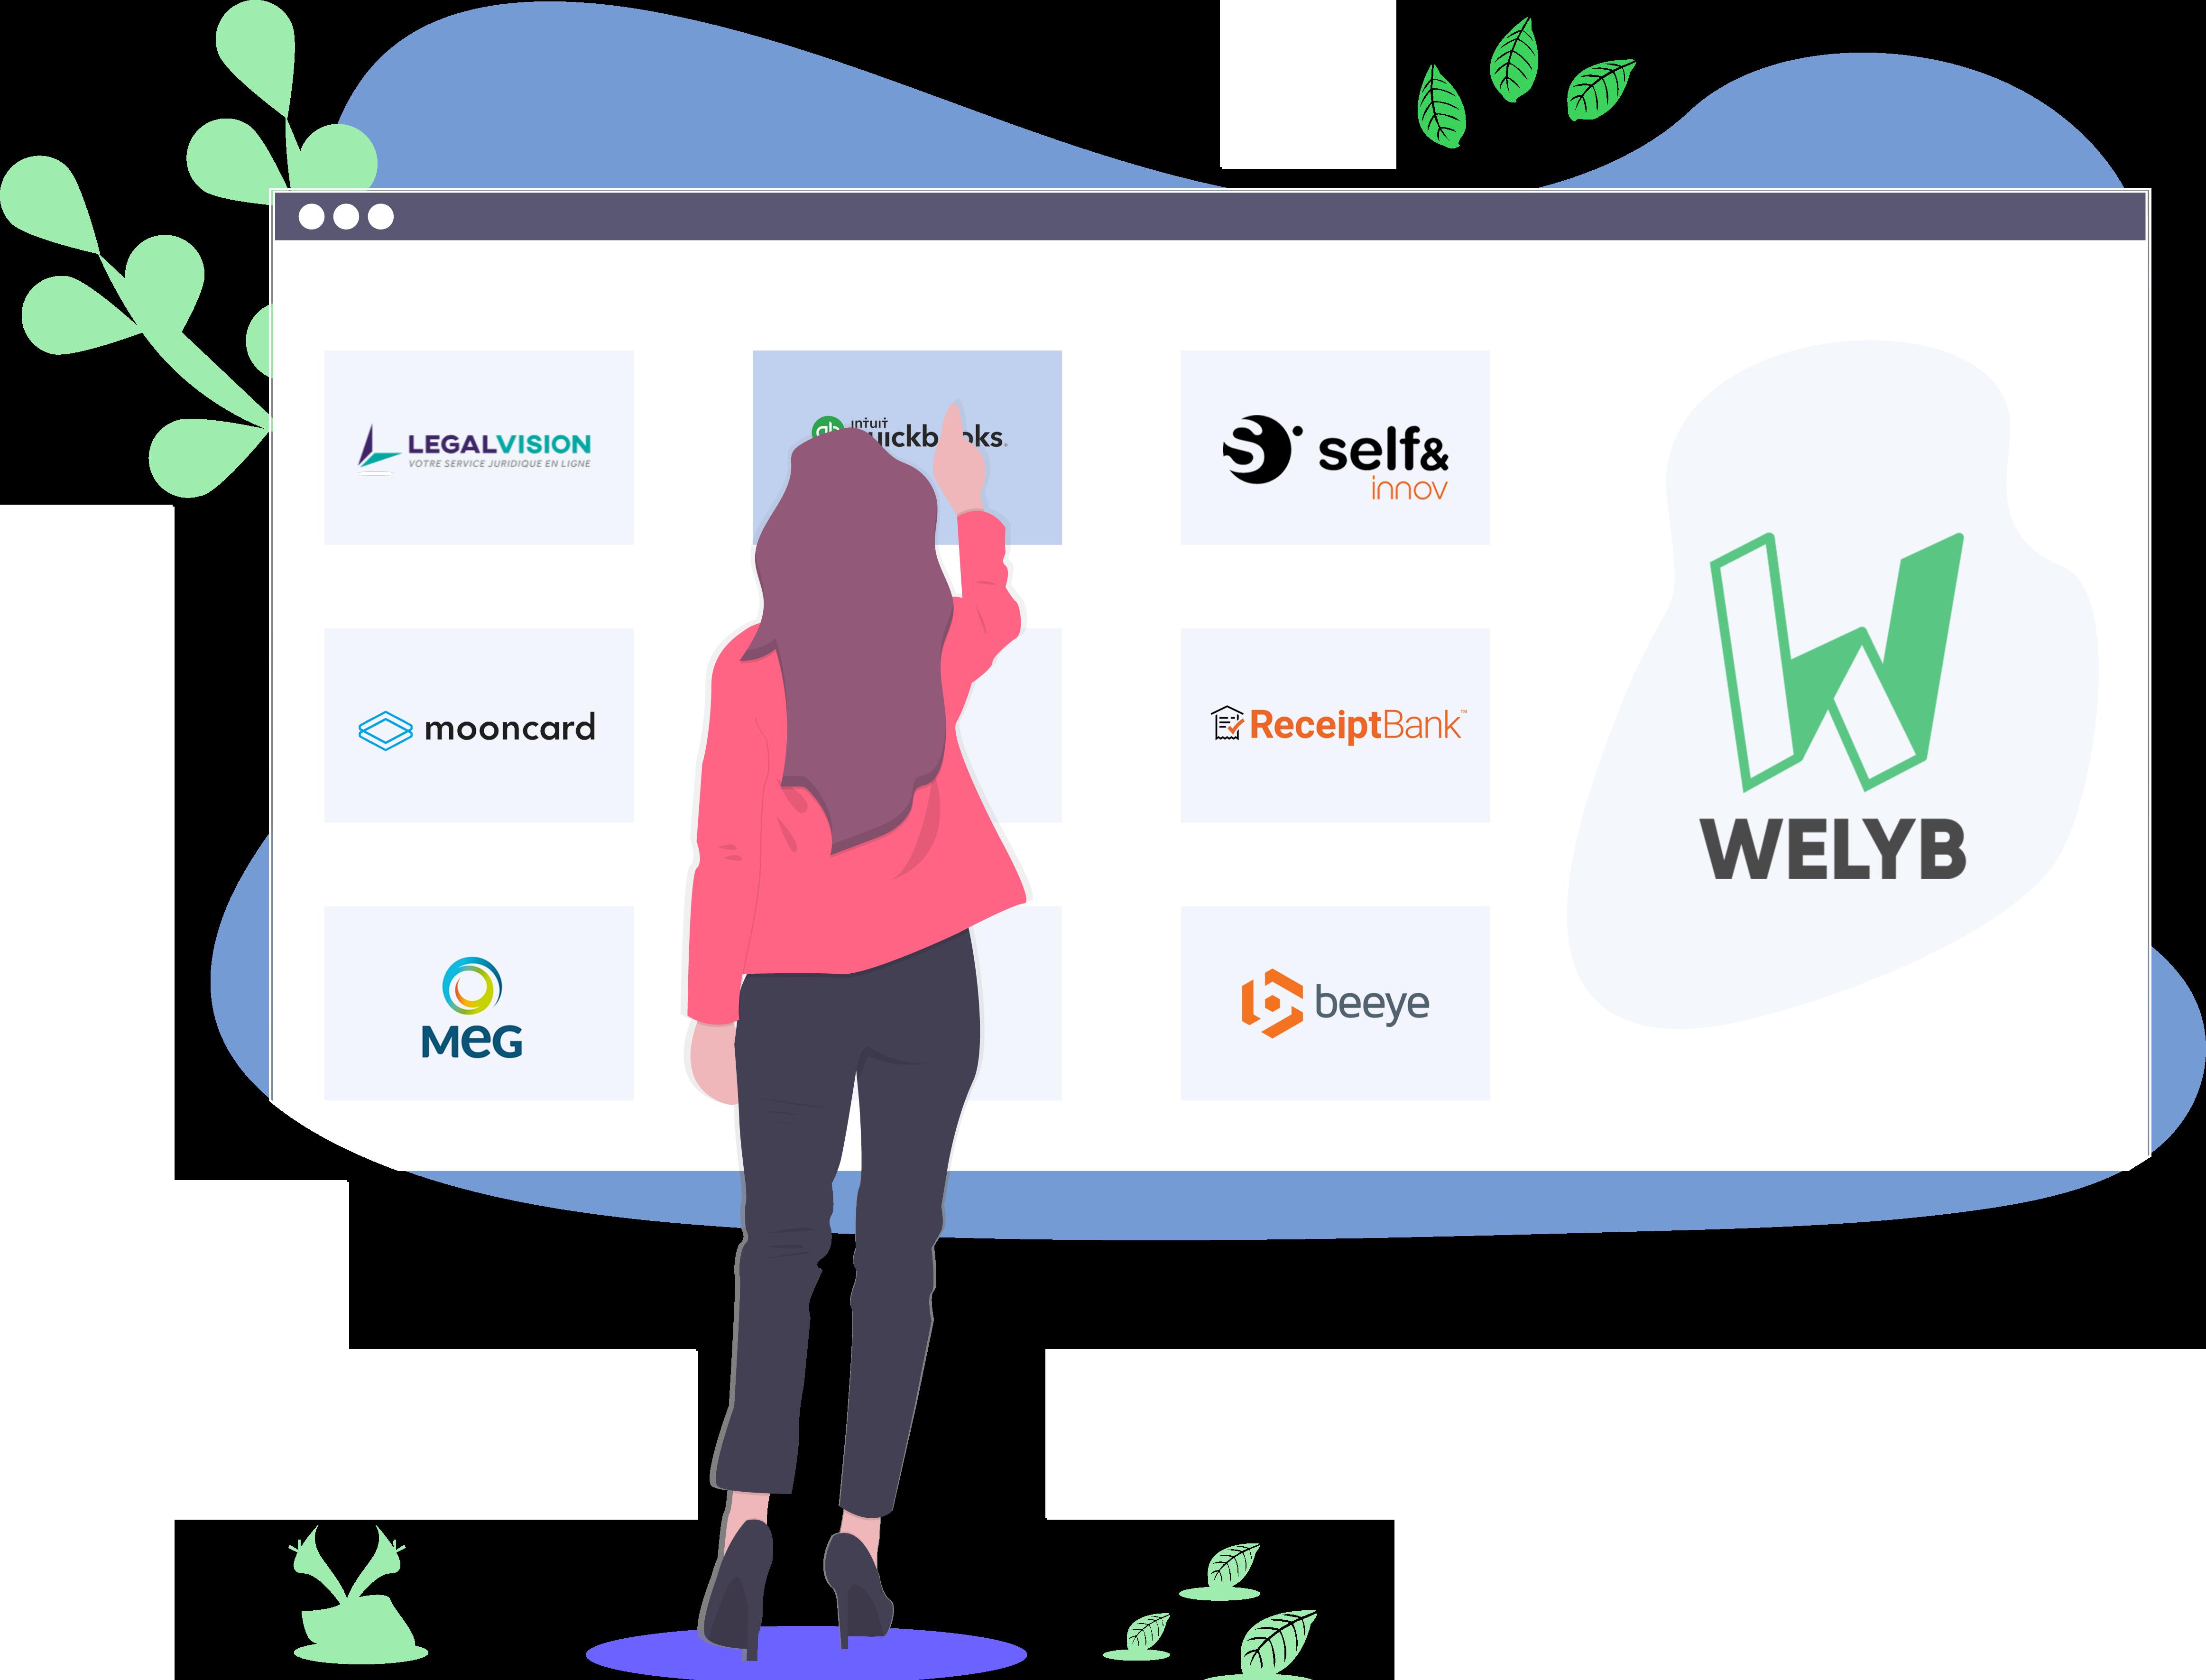 Welyb plateforme gestion expert-comptable